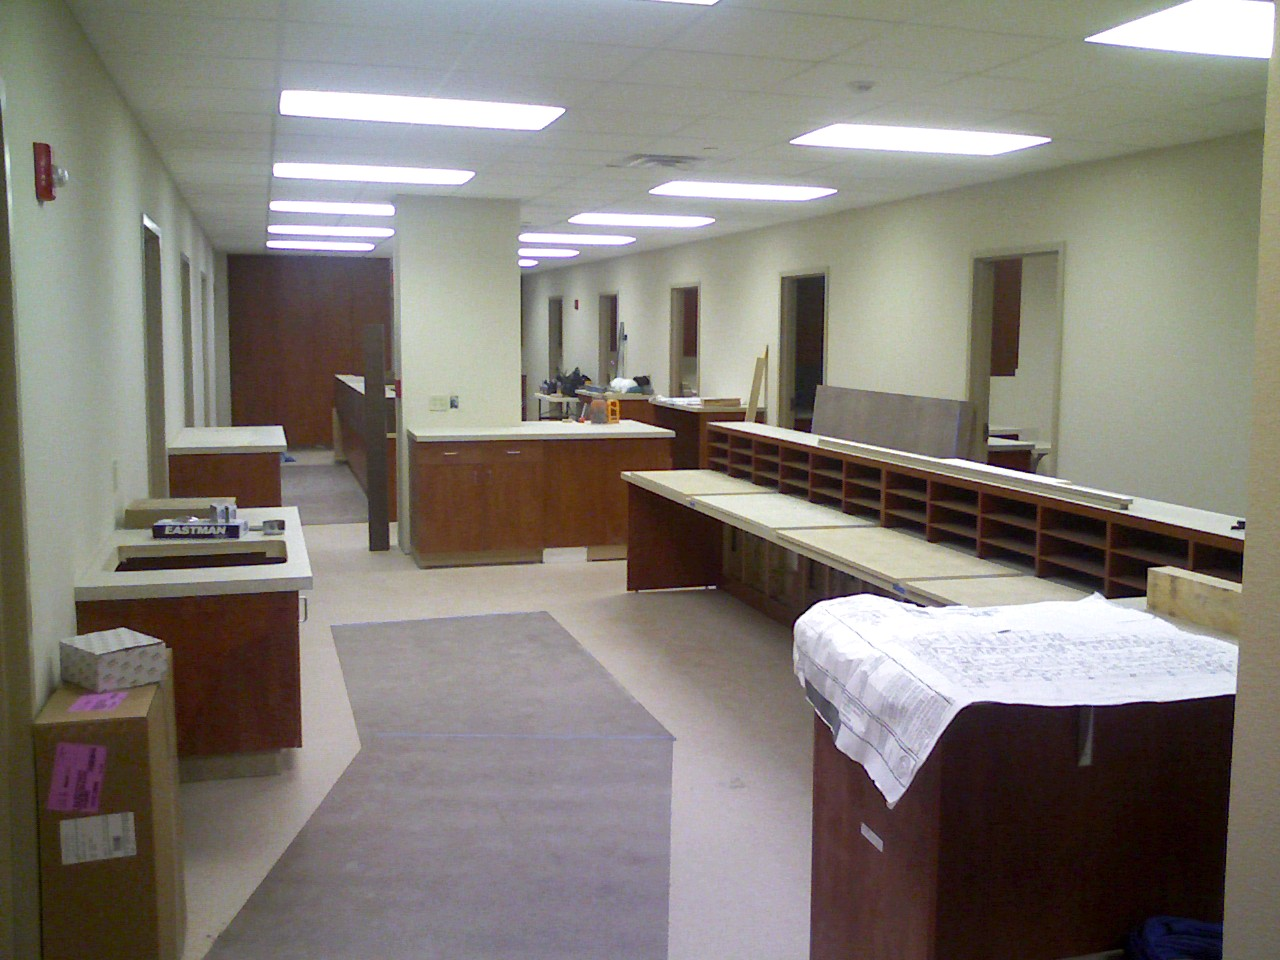 Covenant Health, Lubbock, Tx